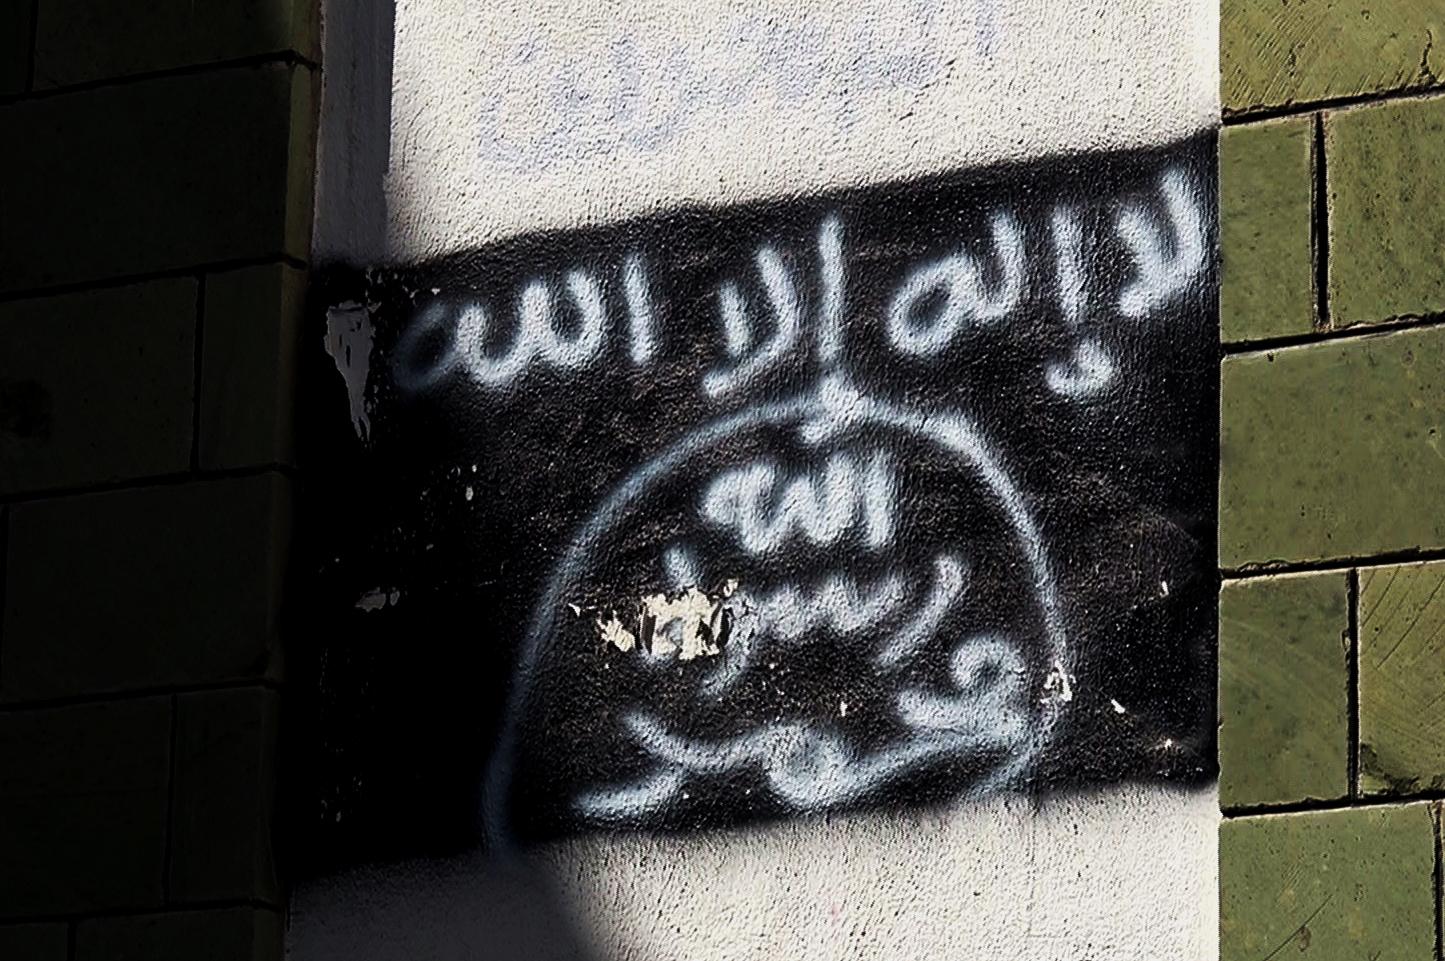 Ali Nawaz, al-Qaeda financier, used Human Concern International bank accounts